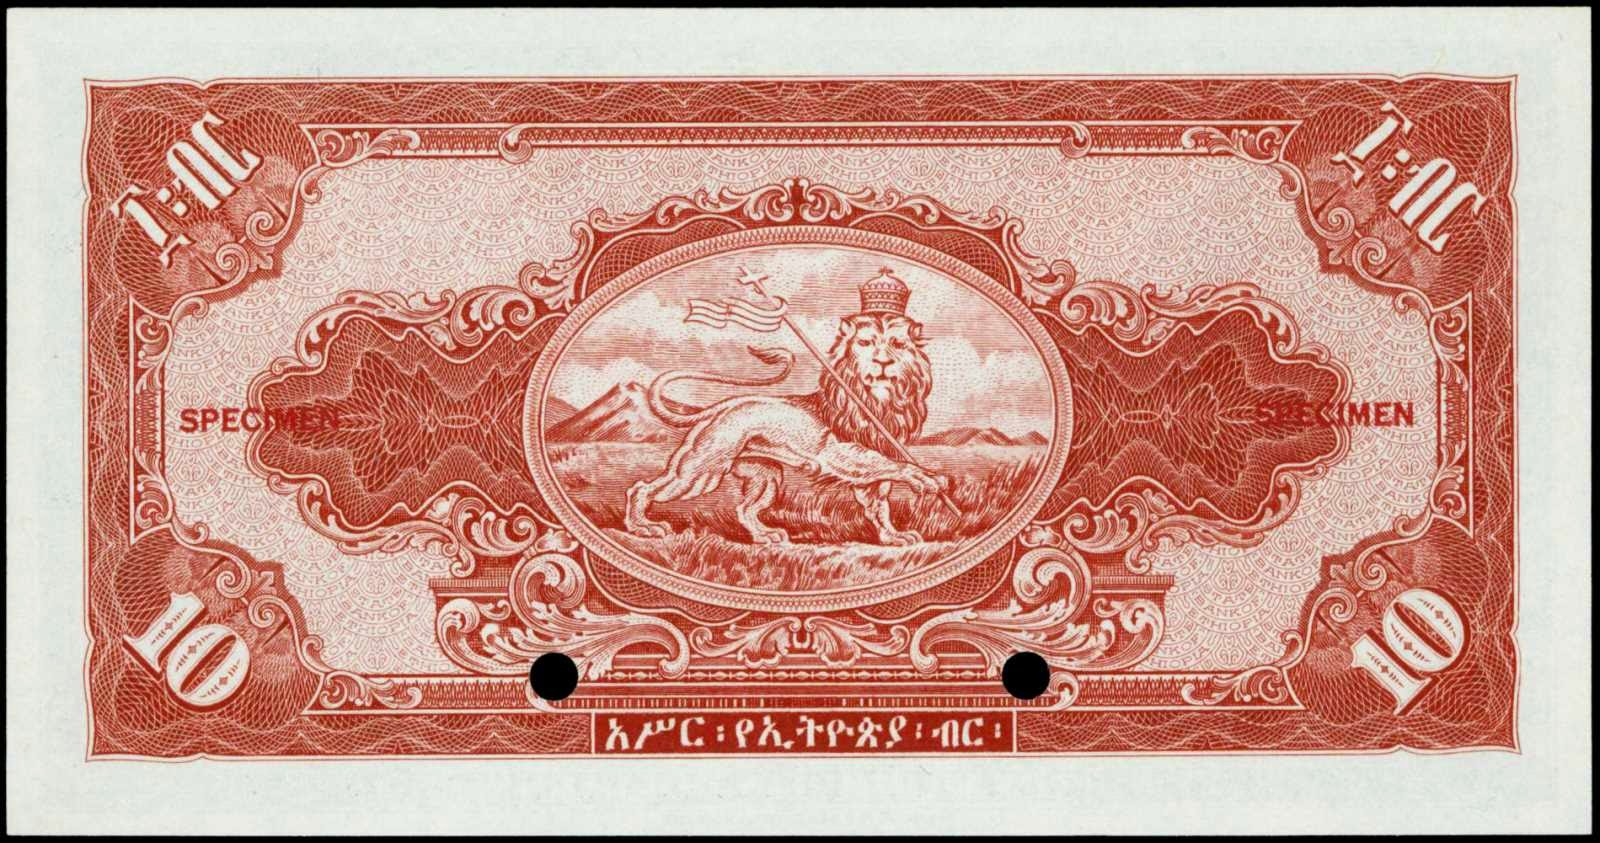 Ethiopia paper money 10 Dollars banknote 1945